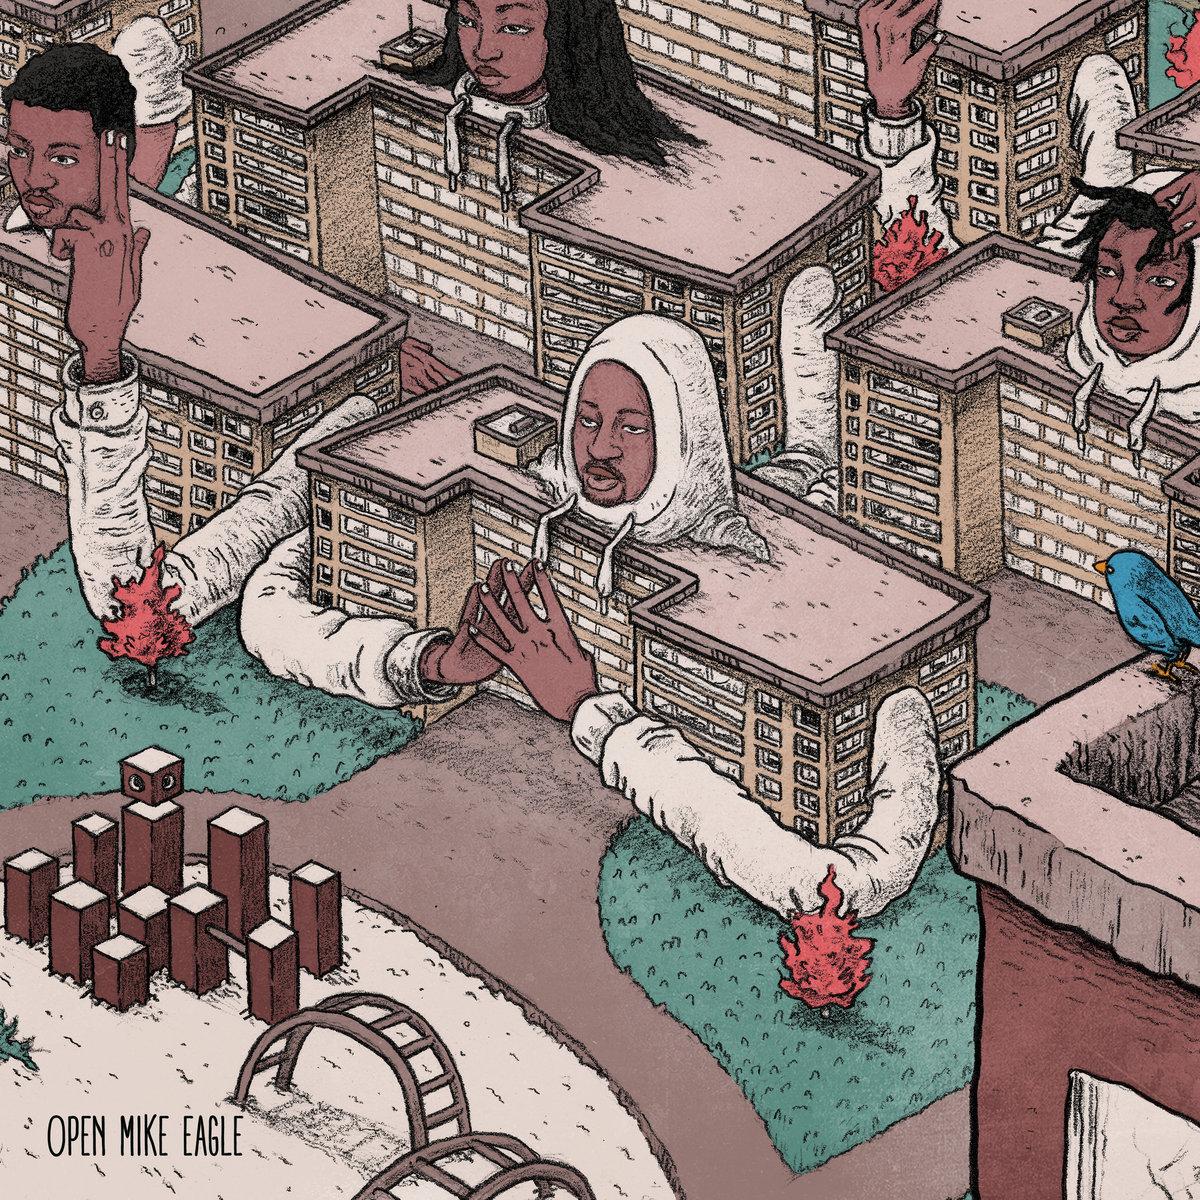 open mike eagle Open Mike Eagle unveils new album, Brick Body Kids Still Daydream: Stream/download